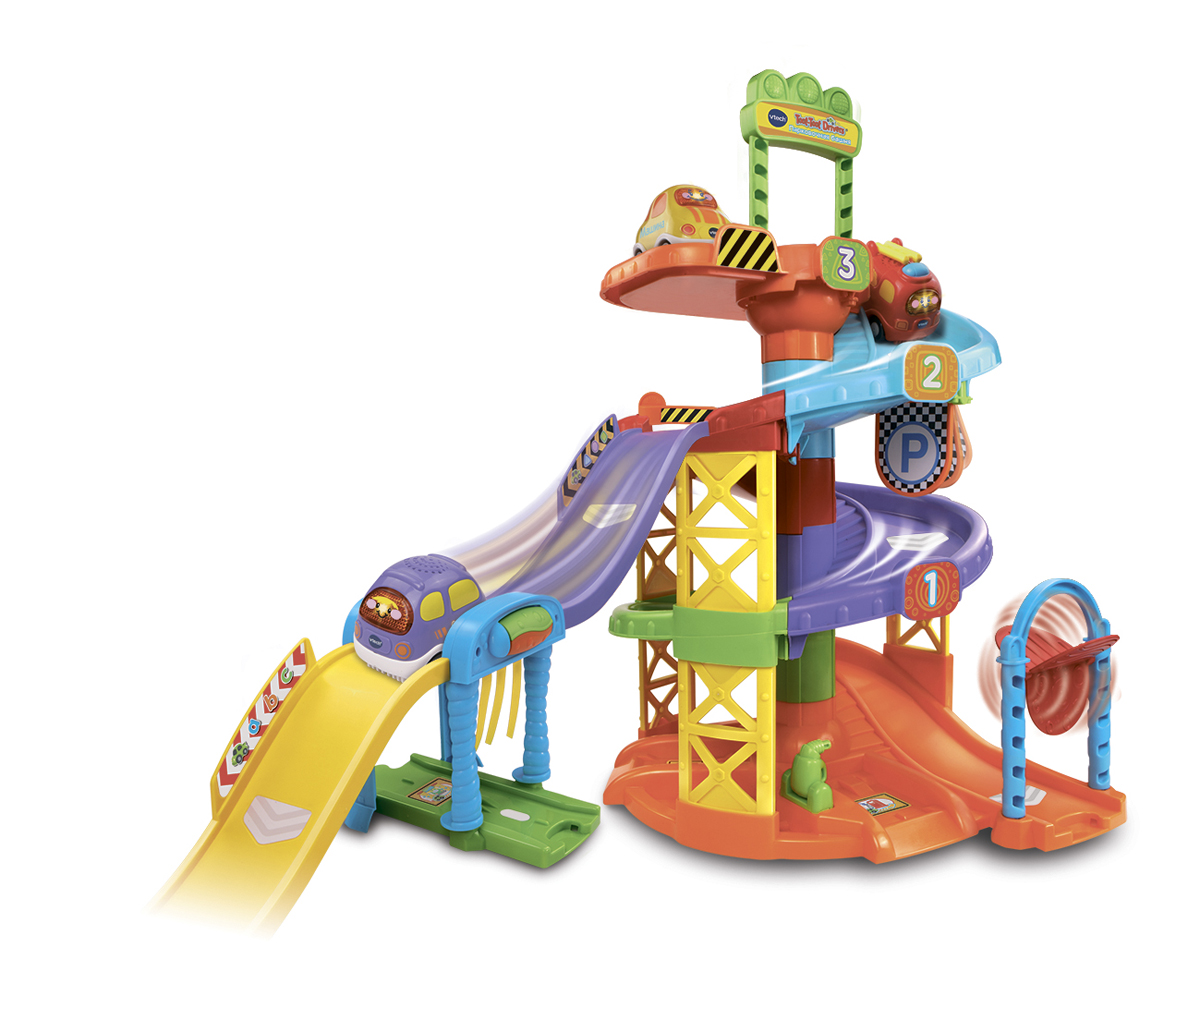 Vtech Игрушечный трек Парковочная башня Бип-Бип Toot-Toot Drivers